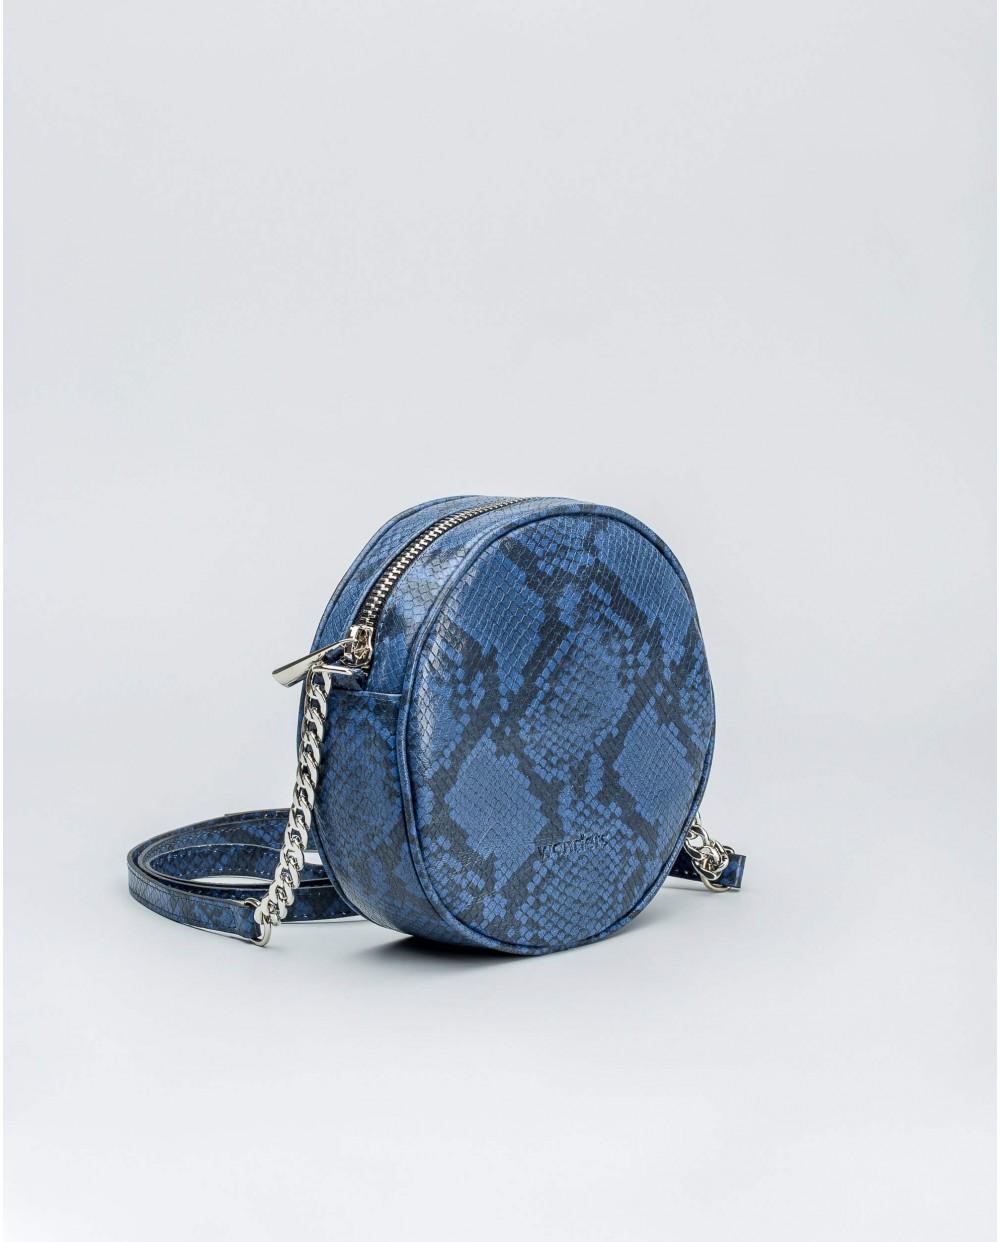 Wonders-Outlet-Circular handbag with crossbody strap